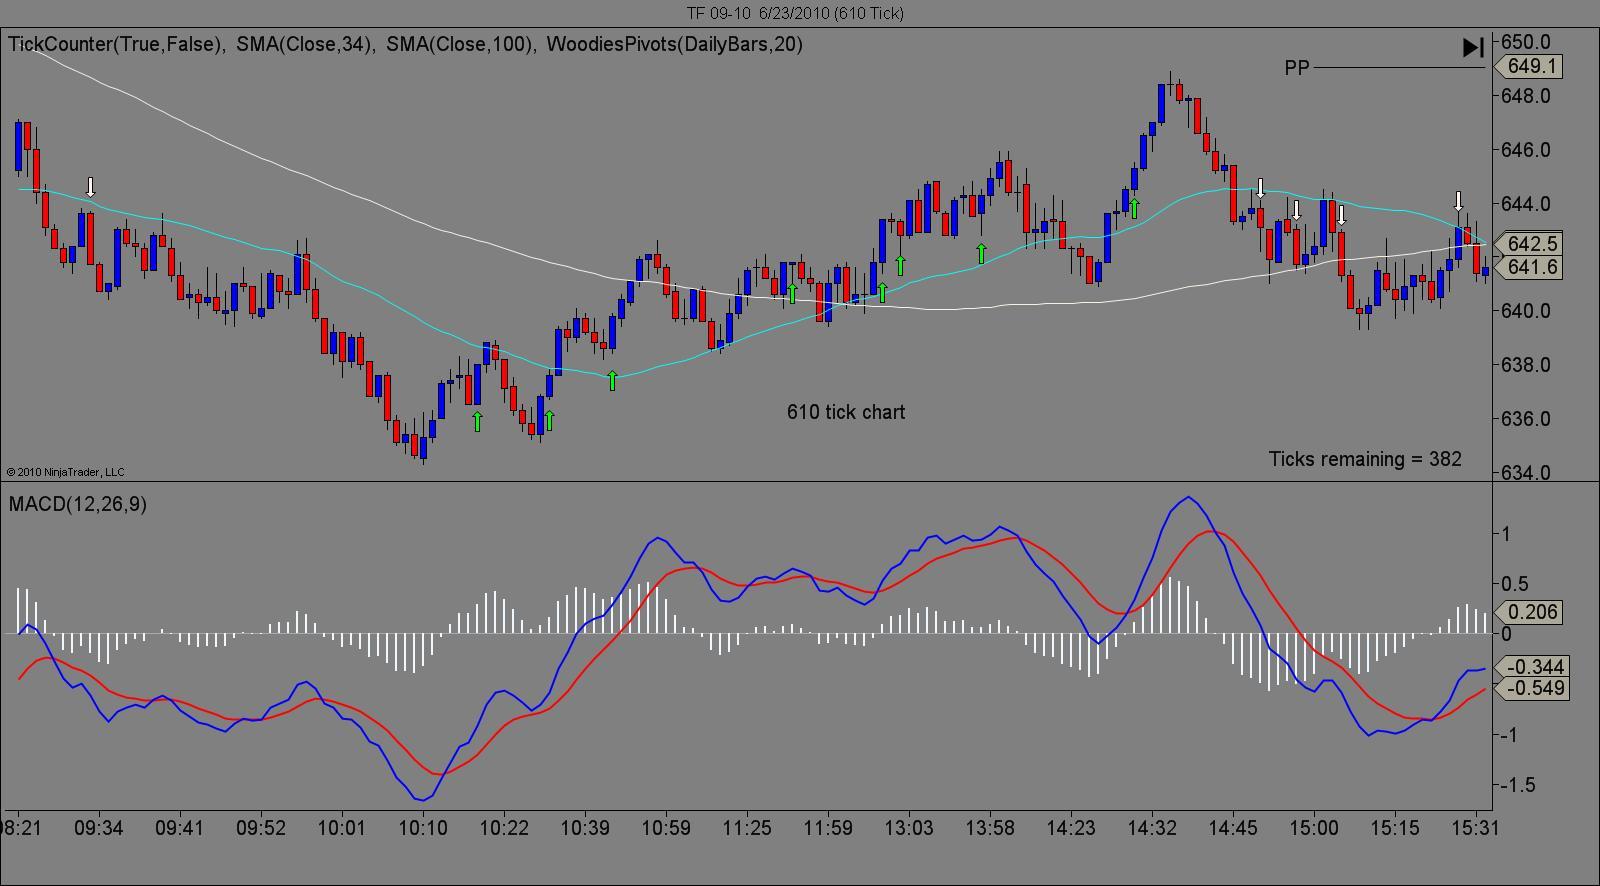 610 tick chart 1